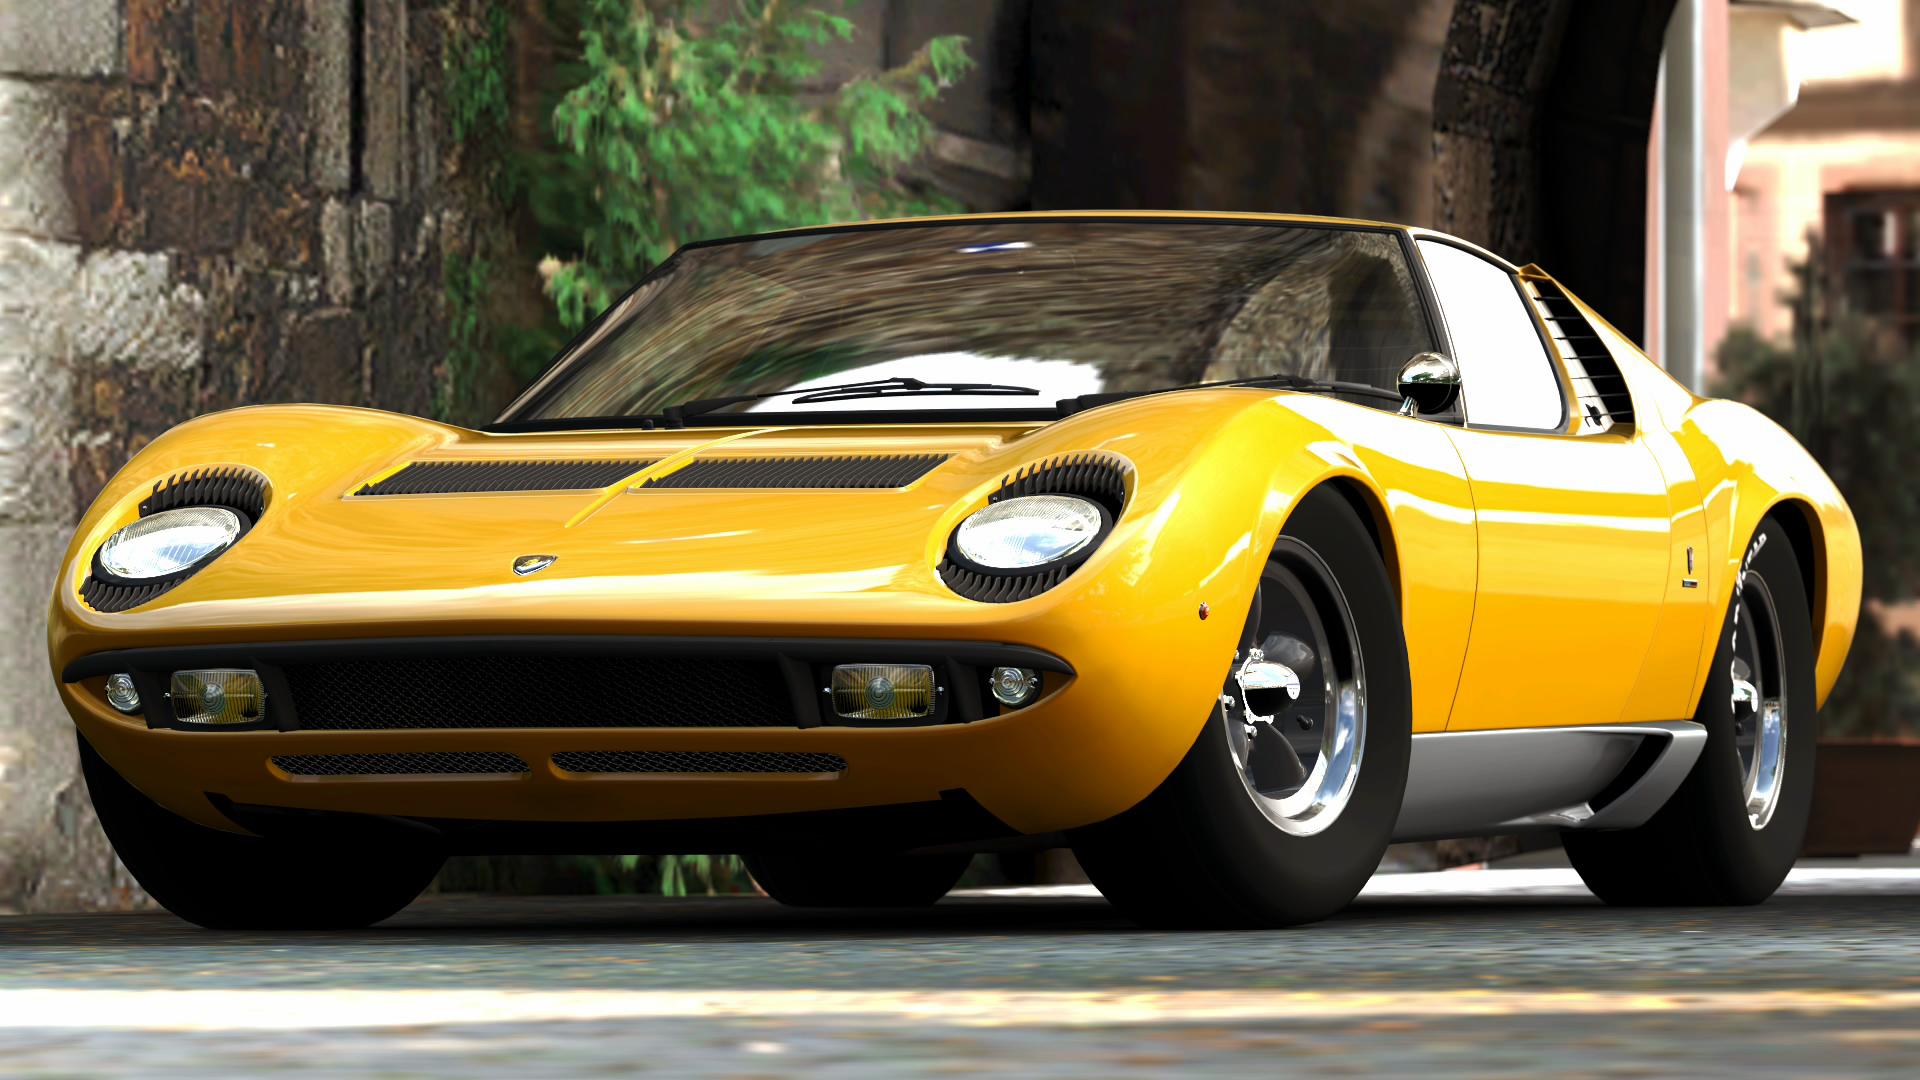 Lamborghini Miura Pics, Vehicles Collection